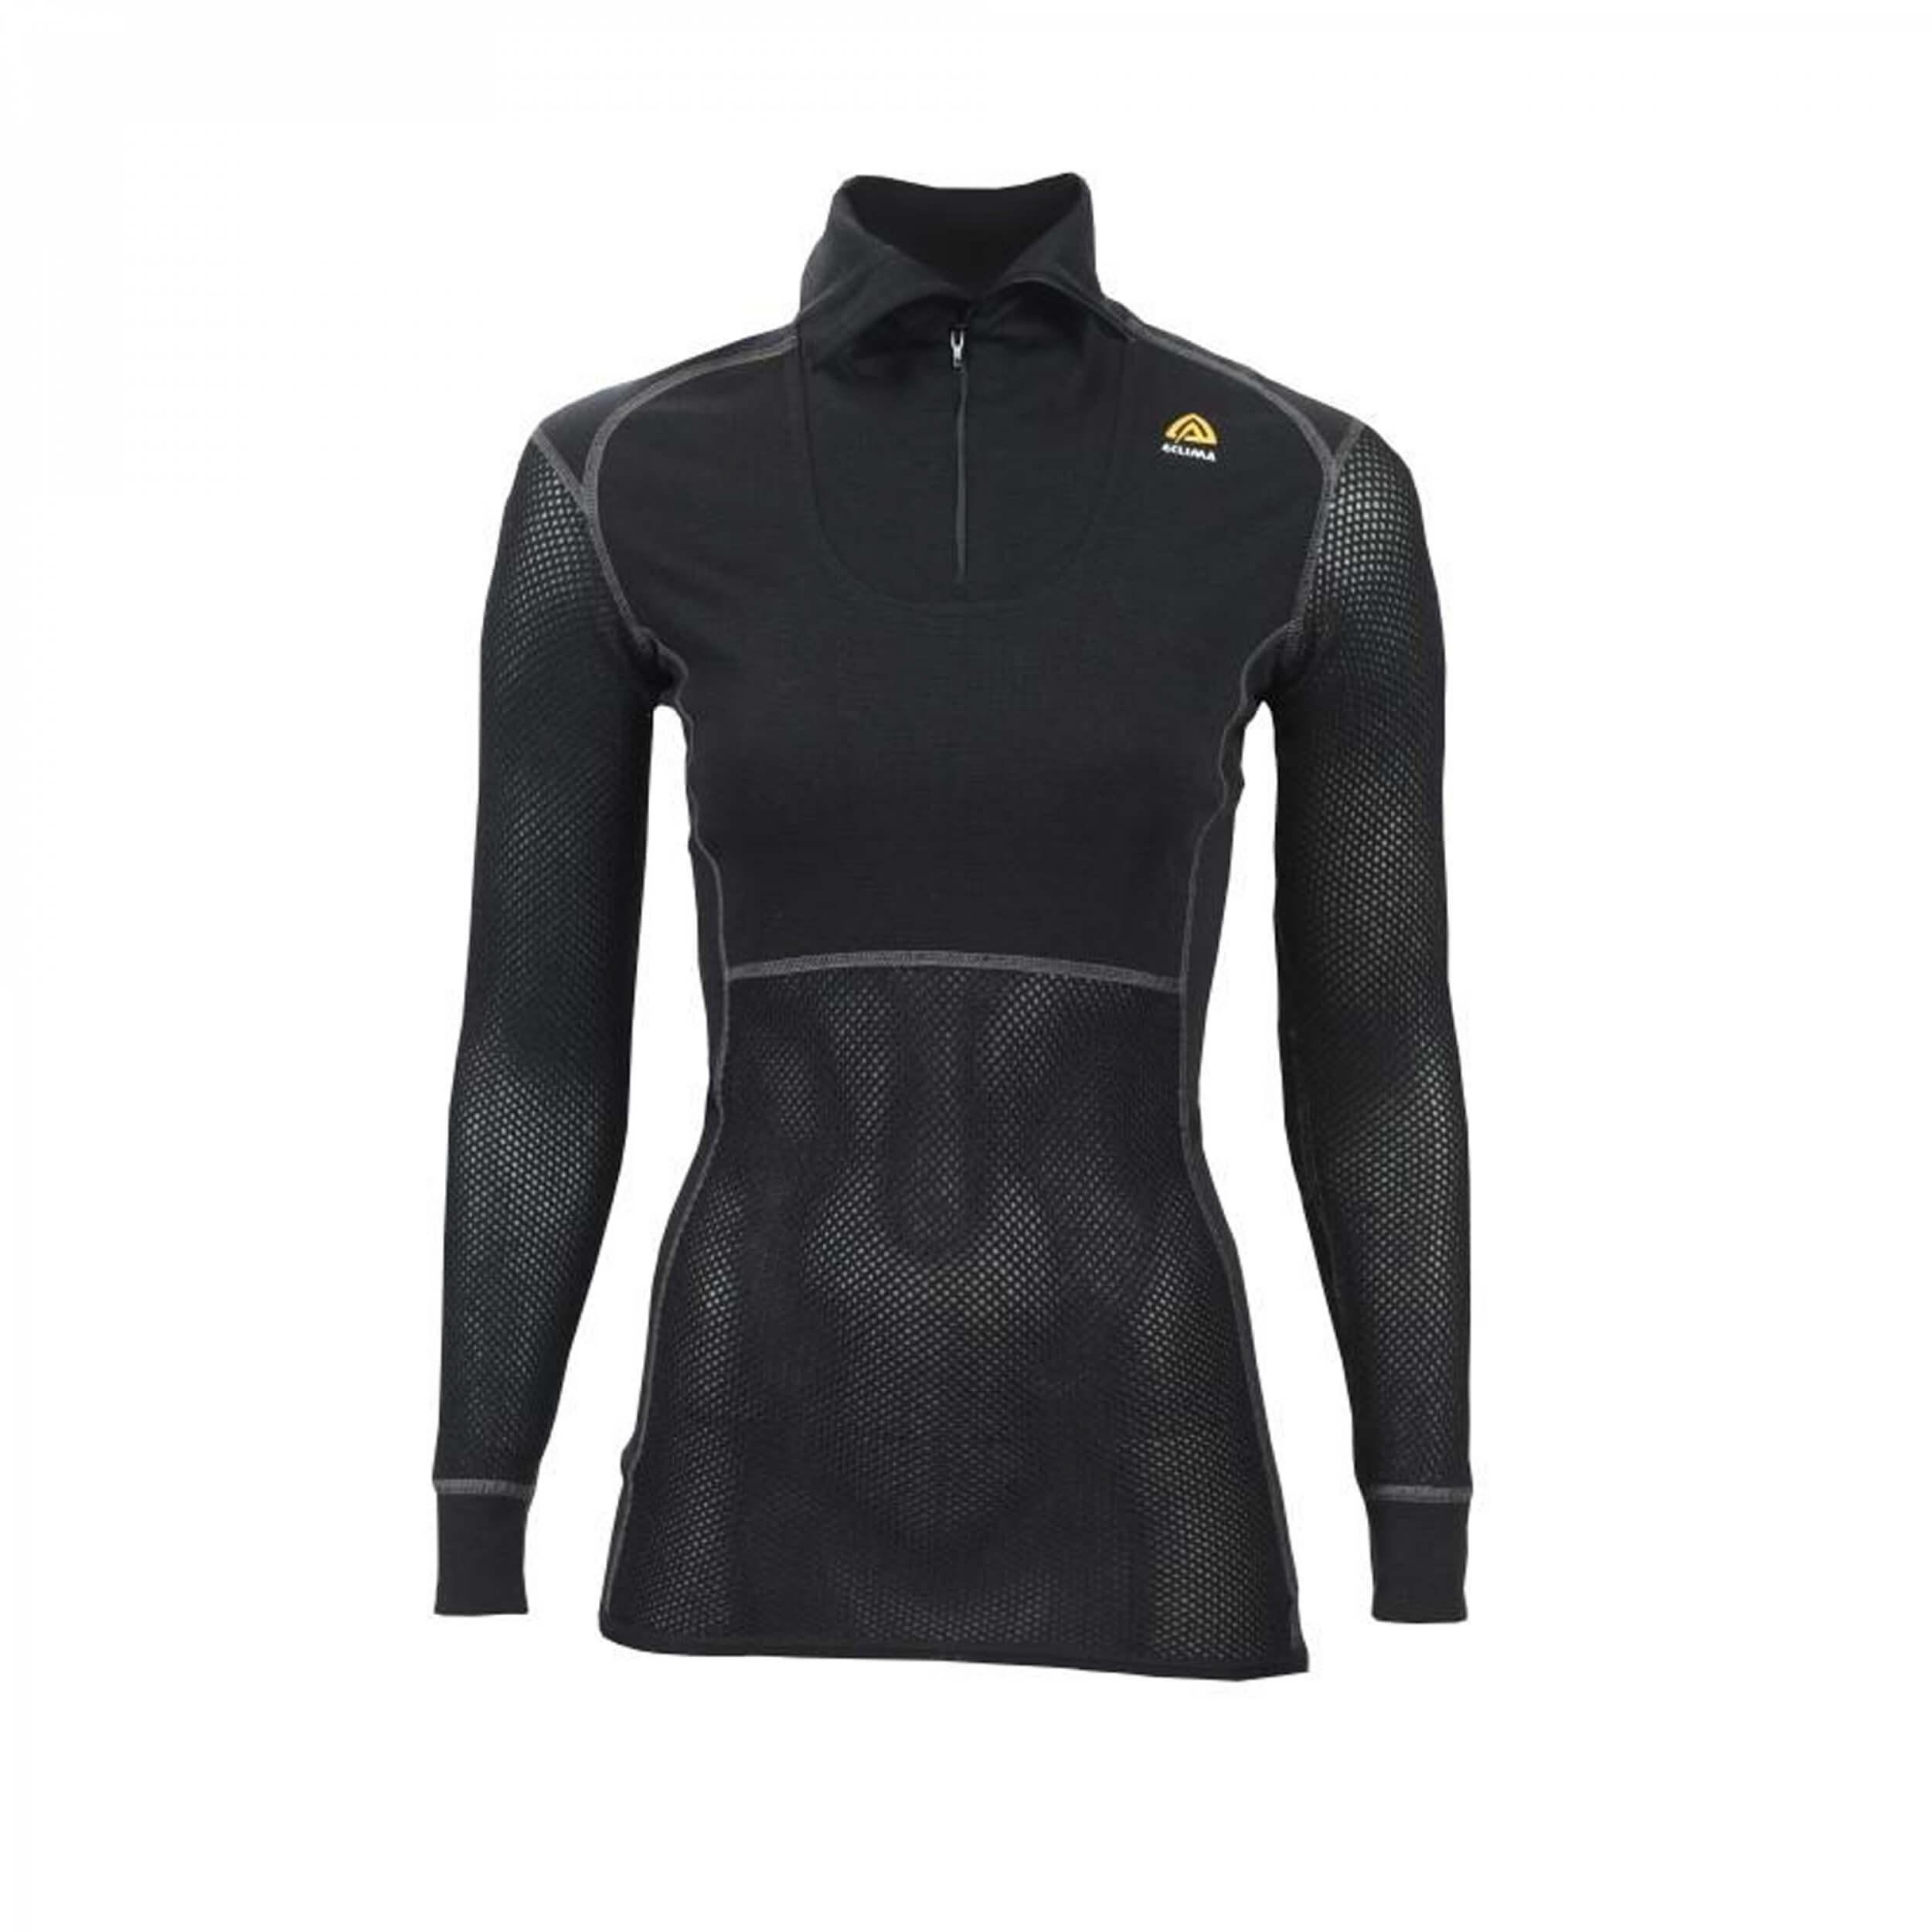 Aclima Woolnet Polo Zip Woman Jet Black